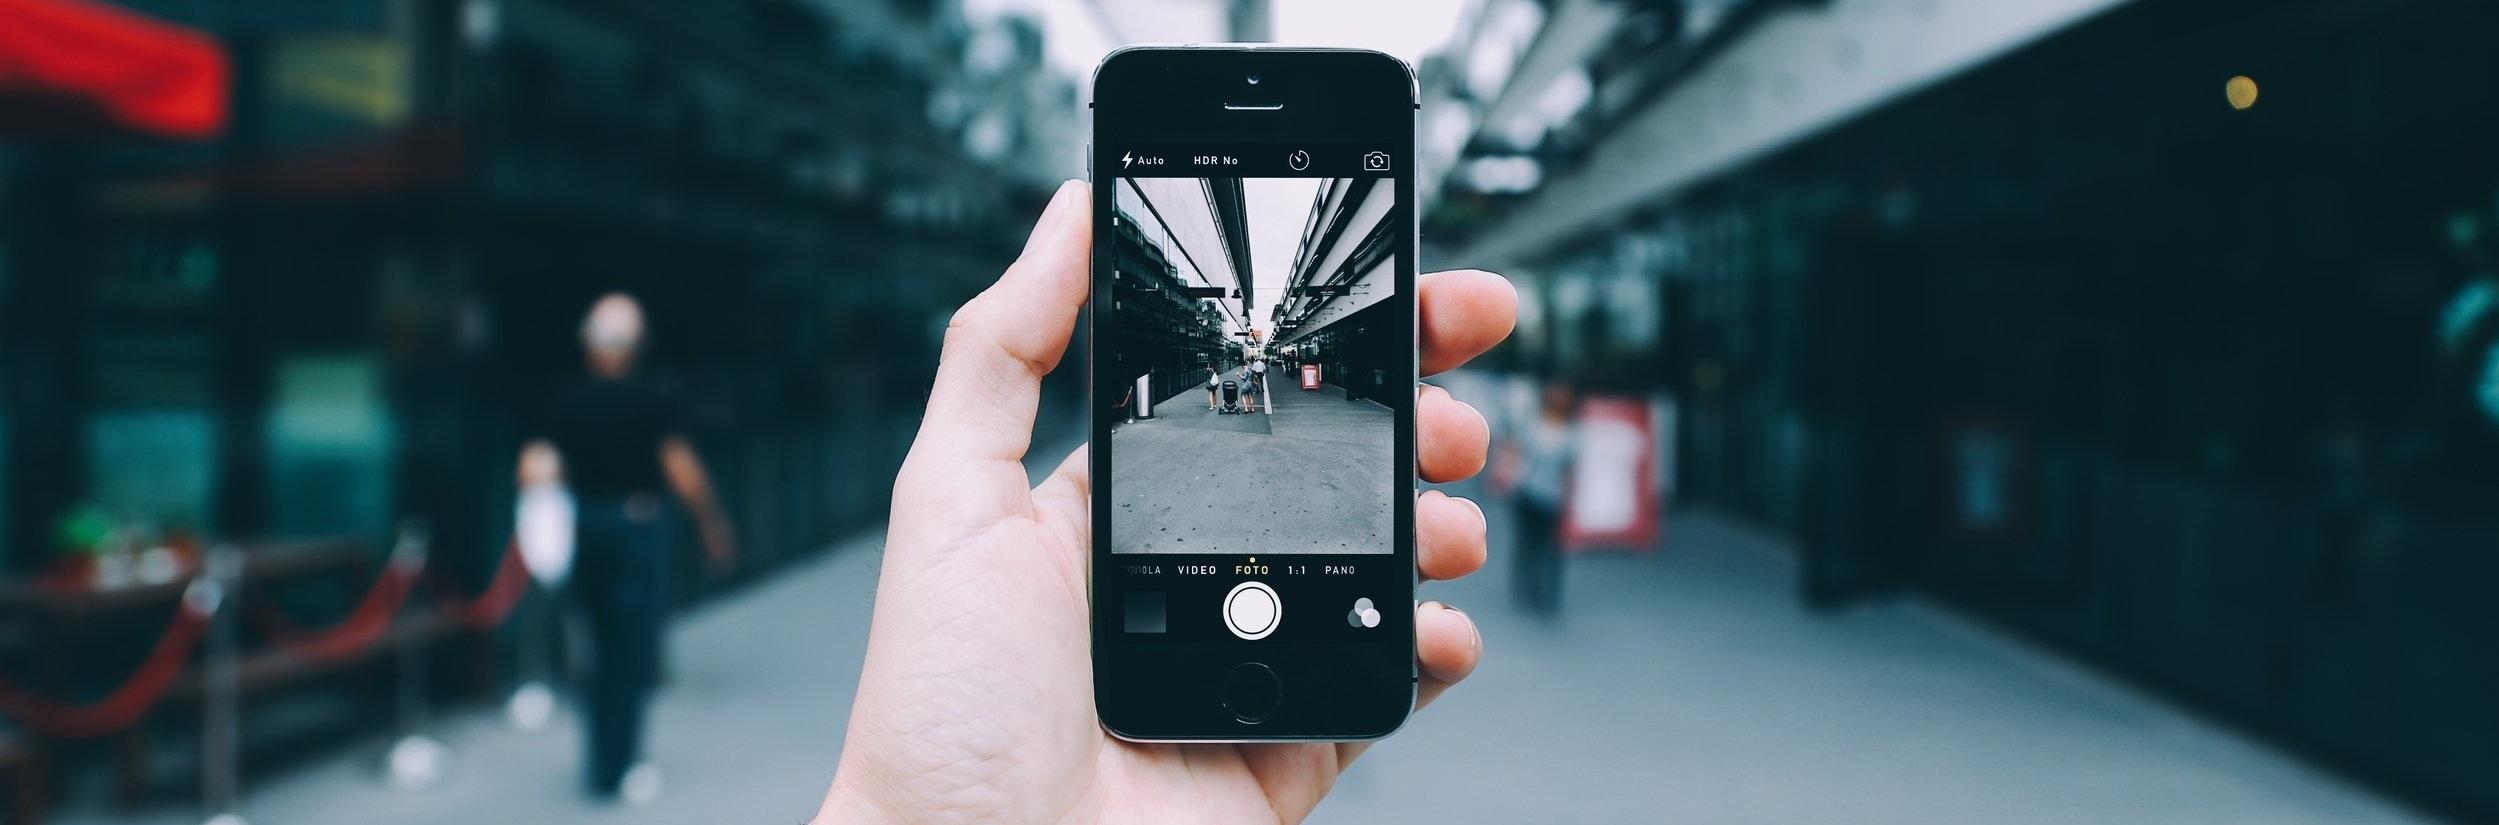 story-snaps.jpg